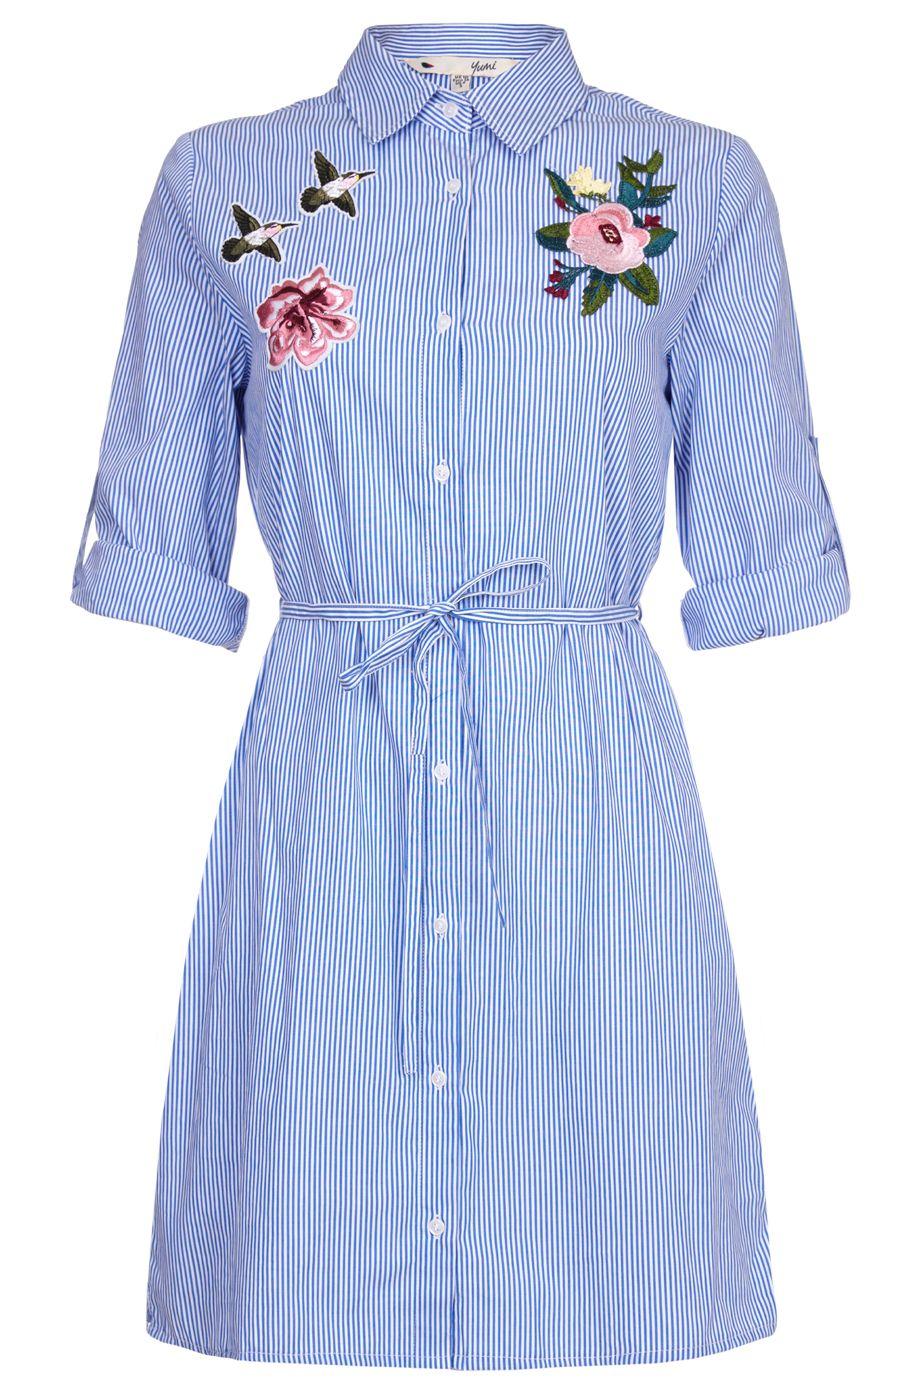 ccca3bd07d27 Σεμιζιε σιελ ριγε φορεμα απο λεπτο υφασμα με εντυπωσιακο floral απλικέ  κεντημα | Yumi London